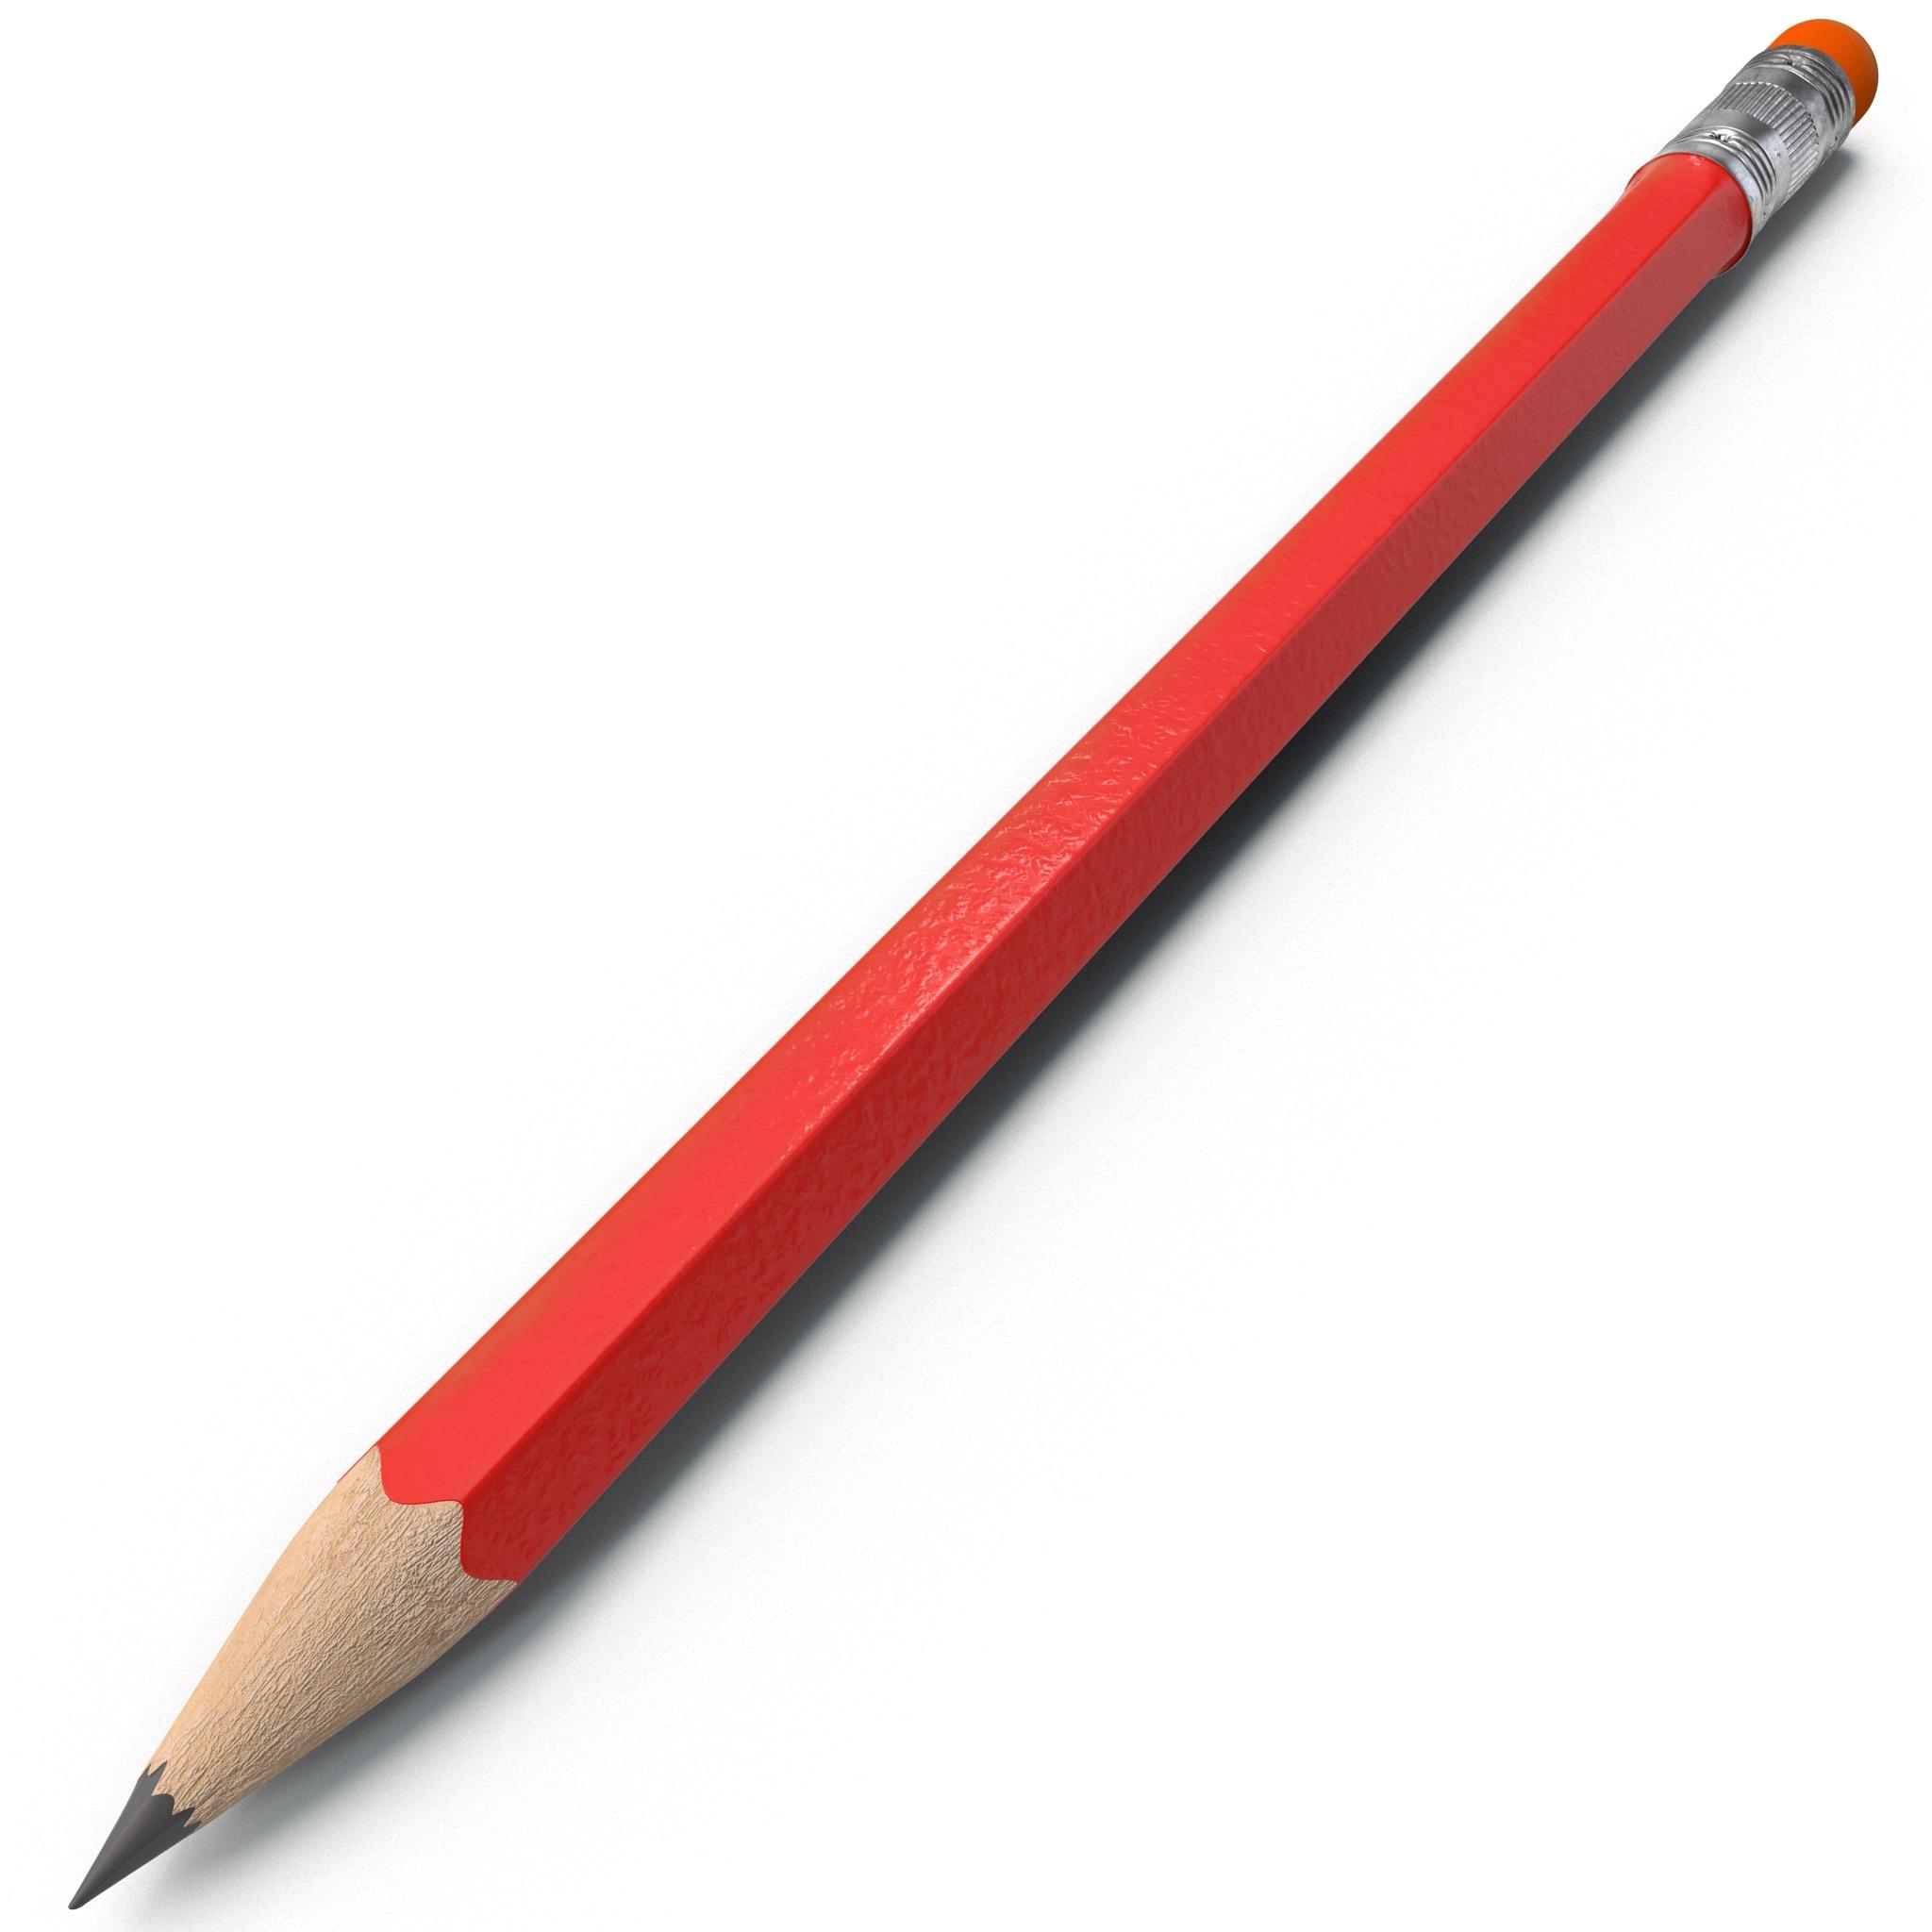 Pencil_3_001.jpg